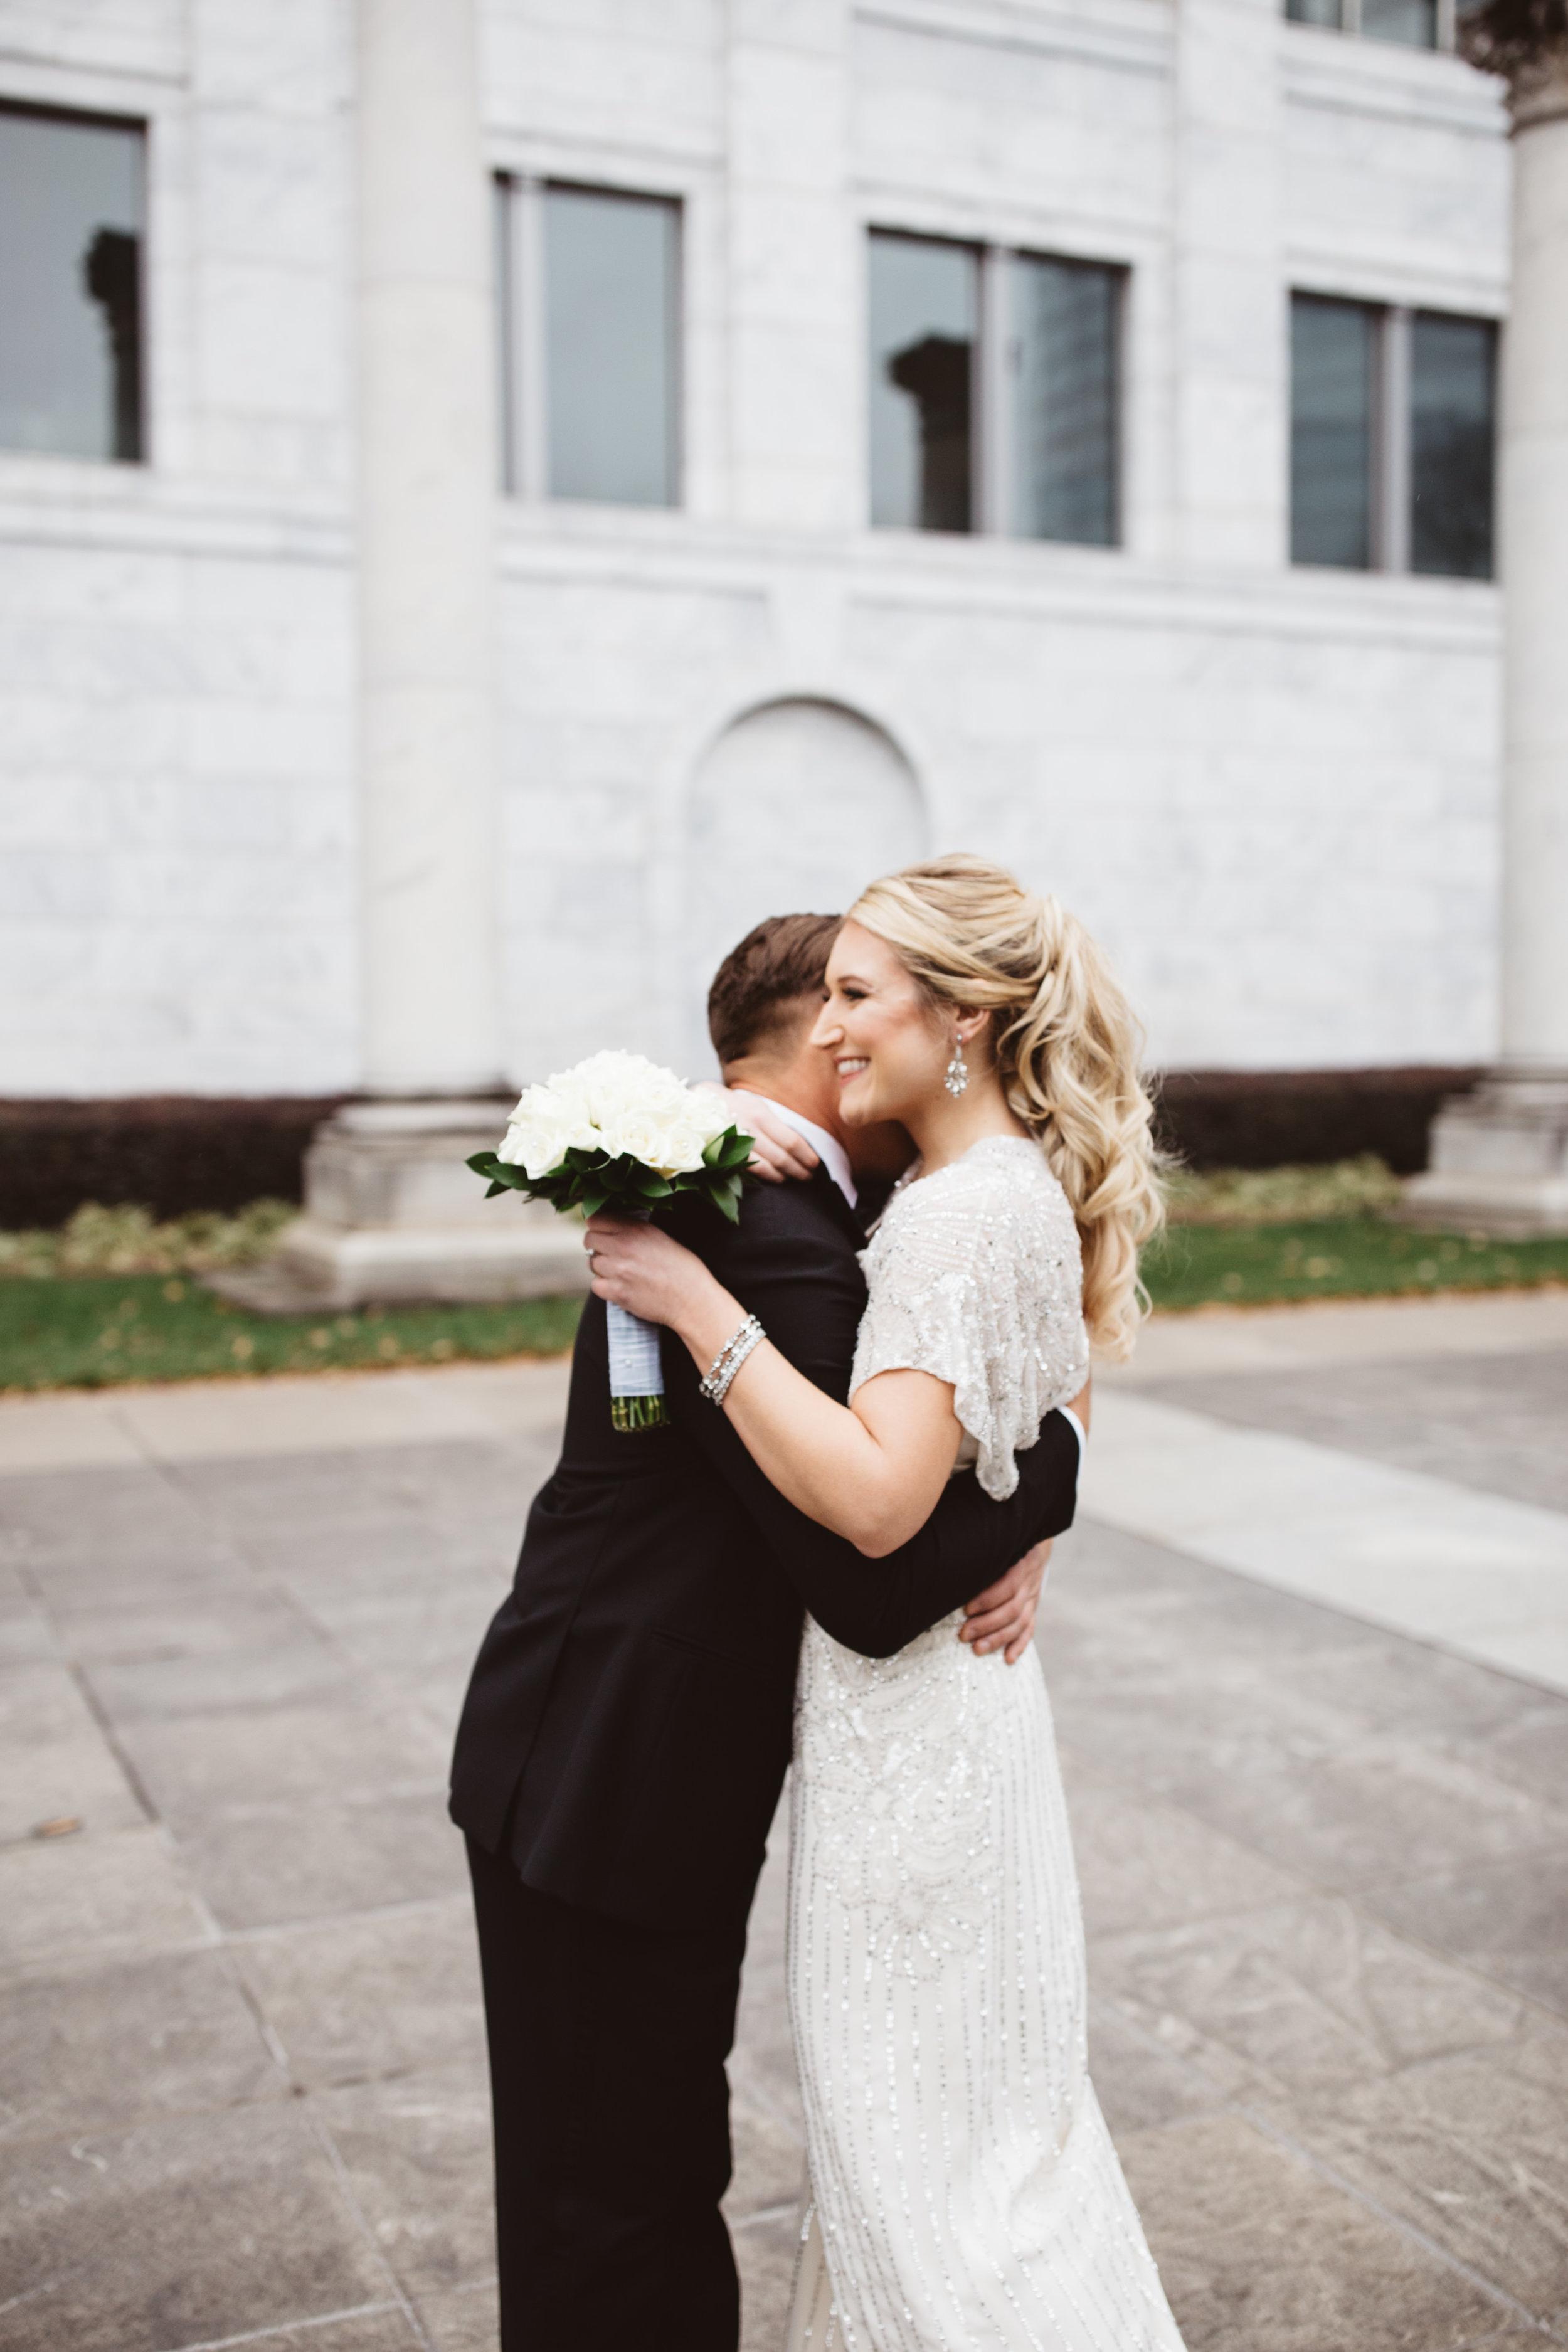 Mattie Bell Photography- Kelly & Zack Wedding Atlanta Brewery -105.jpg